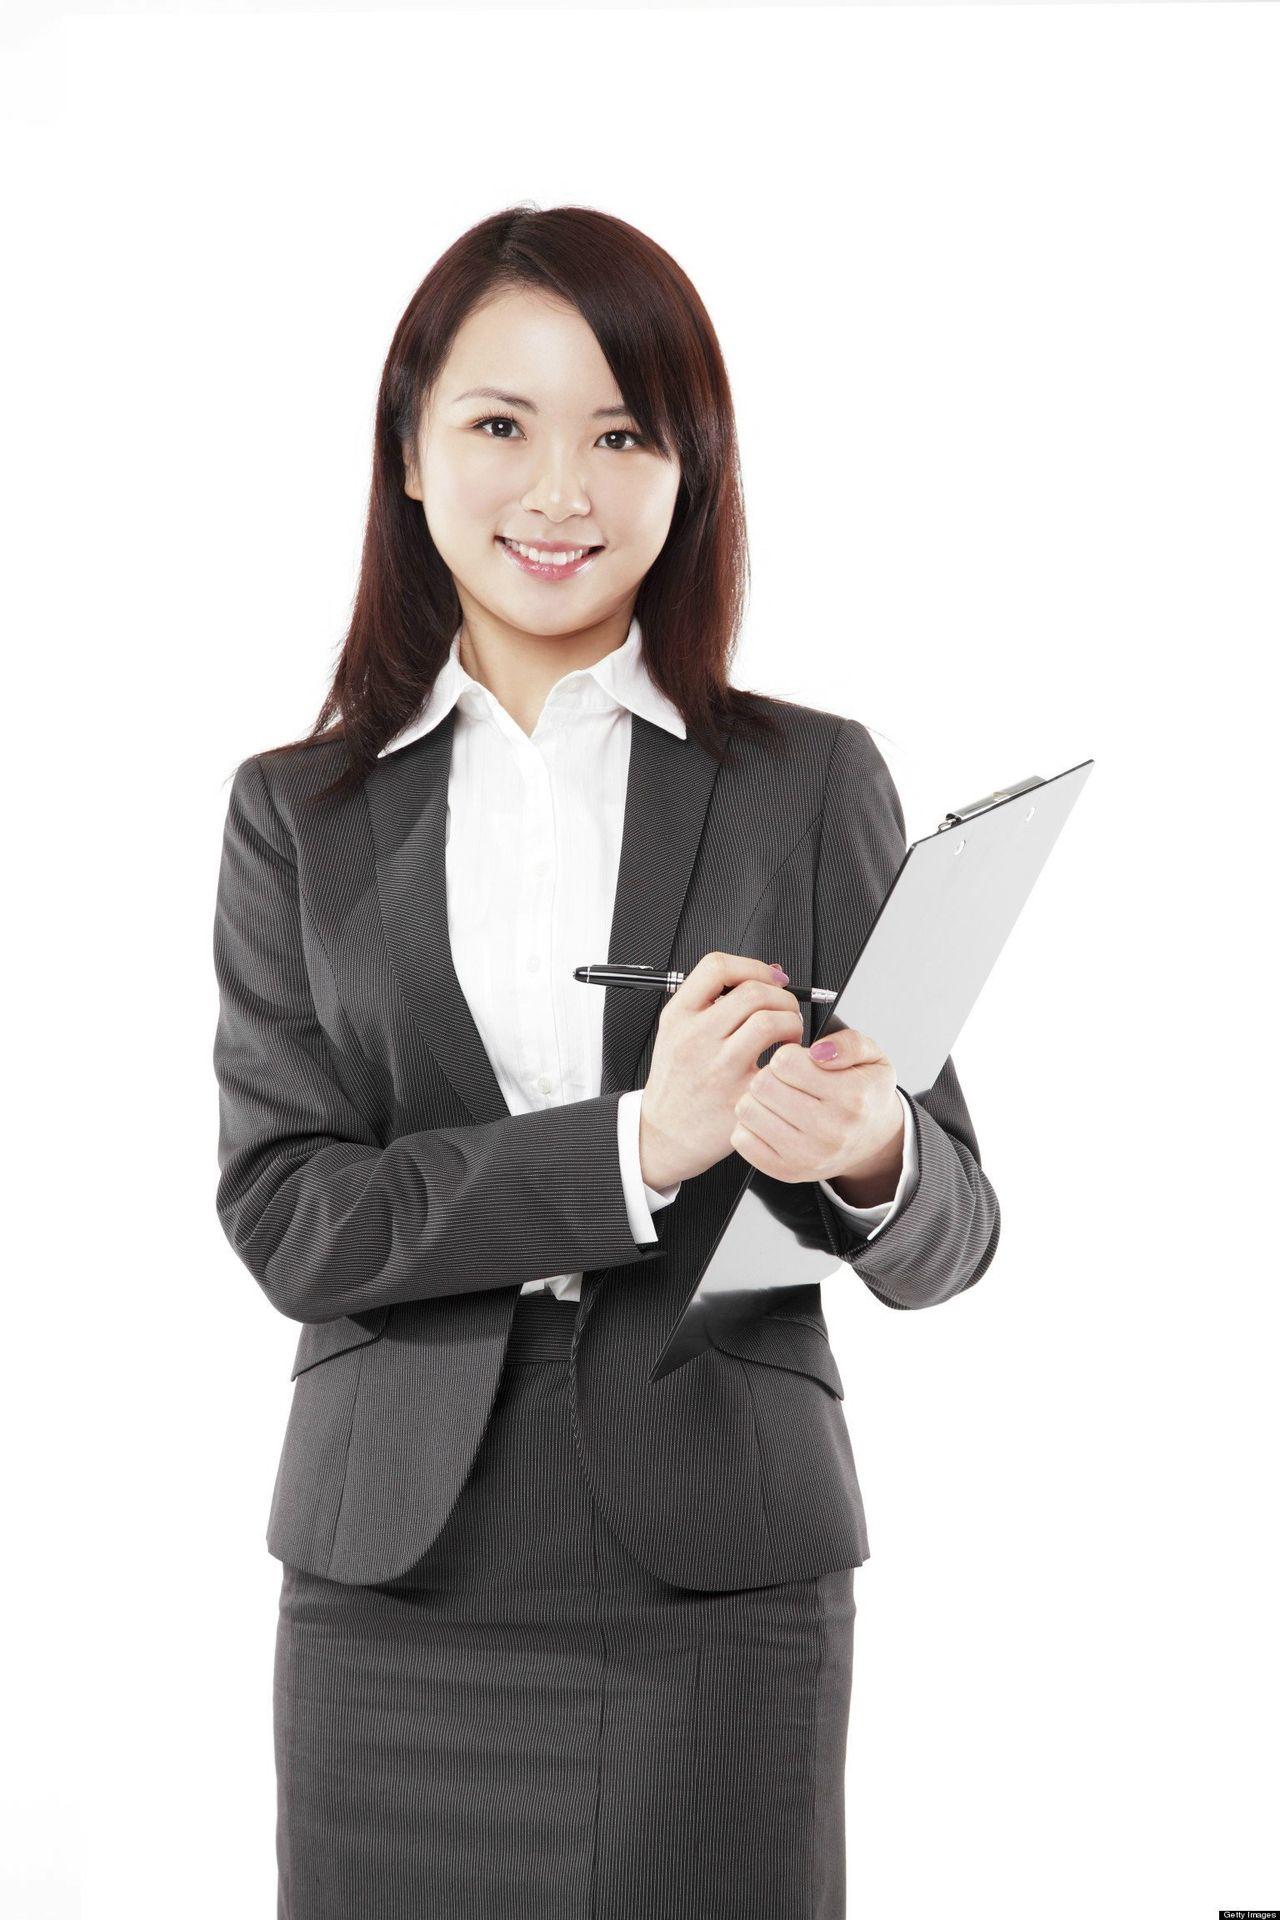 o-business-woman-facebook-business-woman